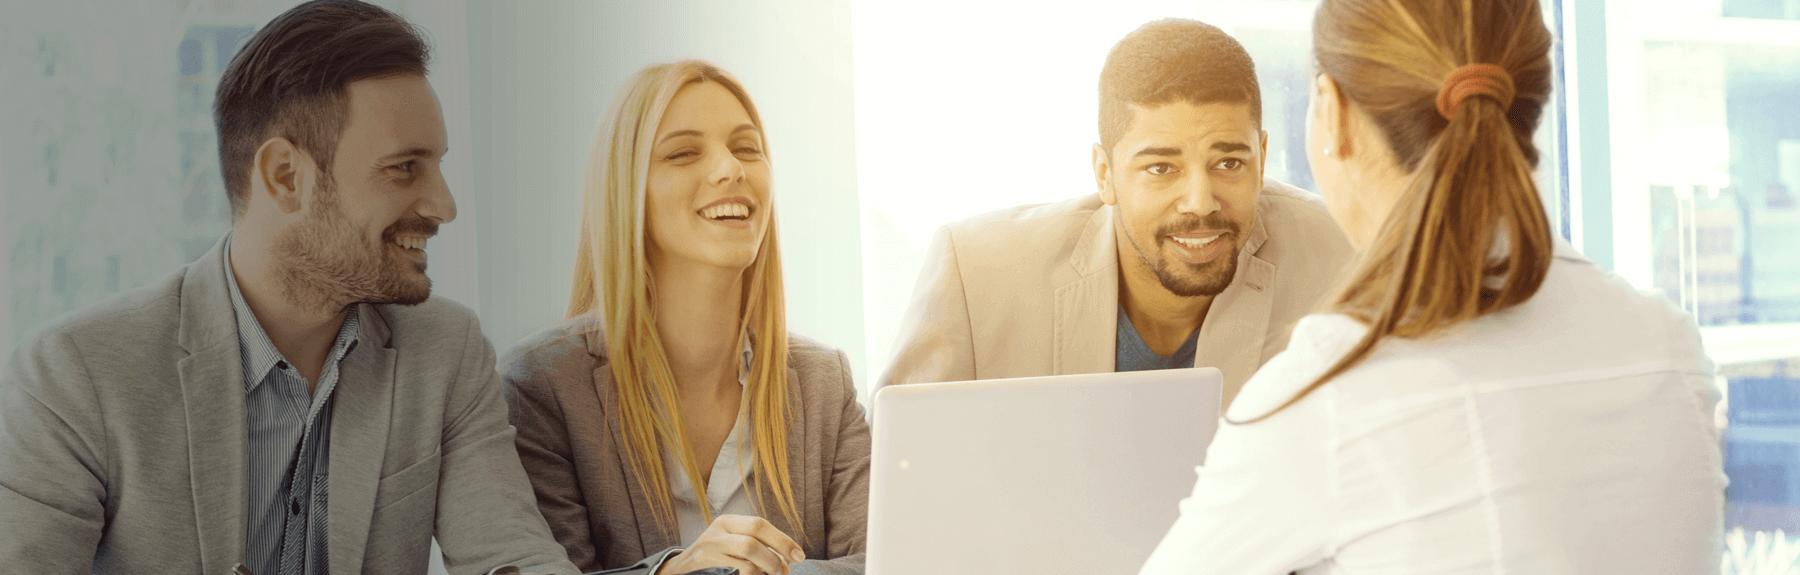 ux-job-interview-expert-tips-header